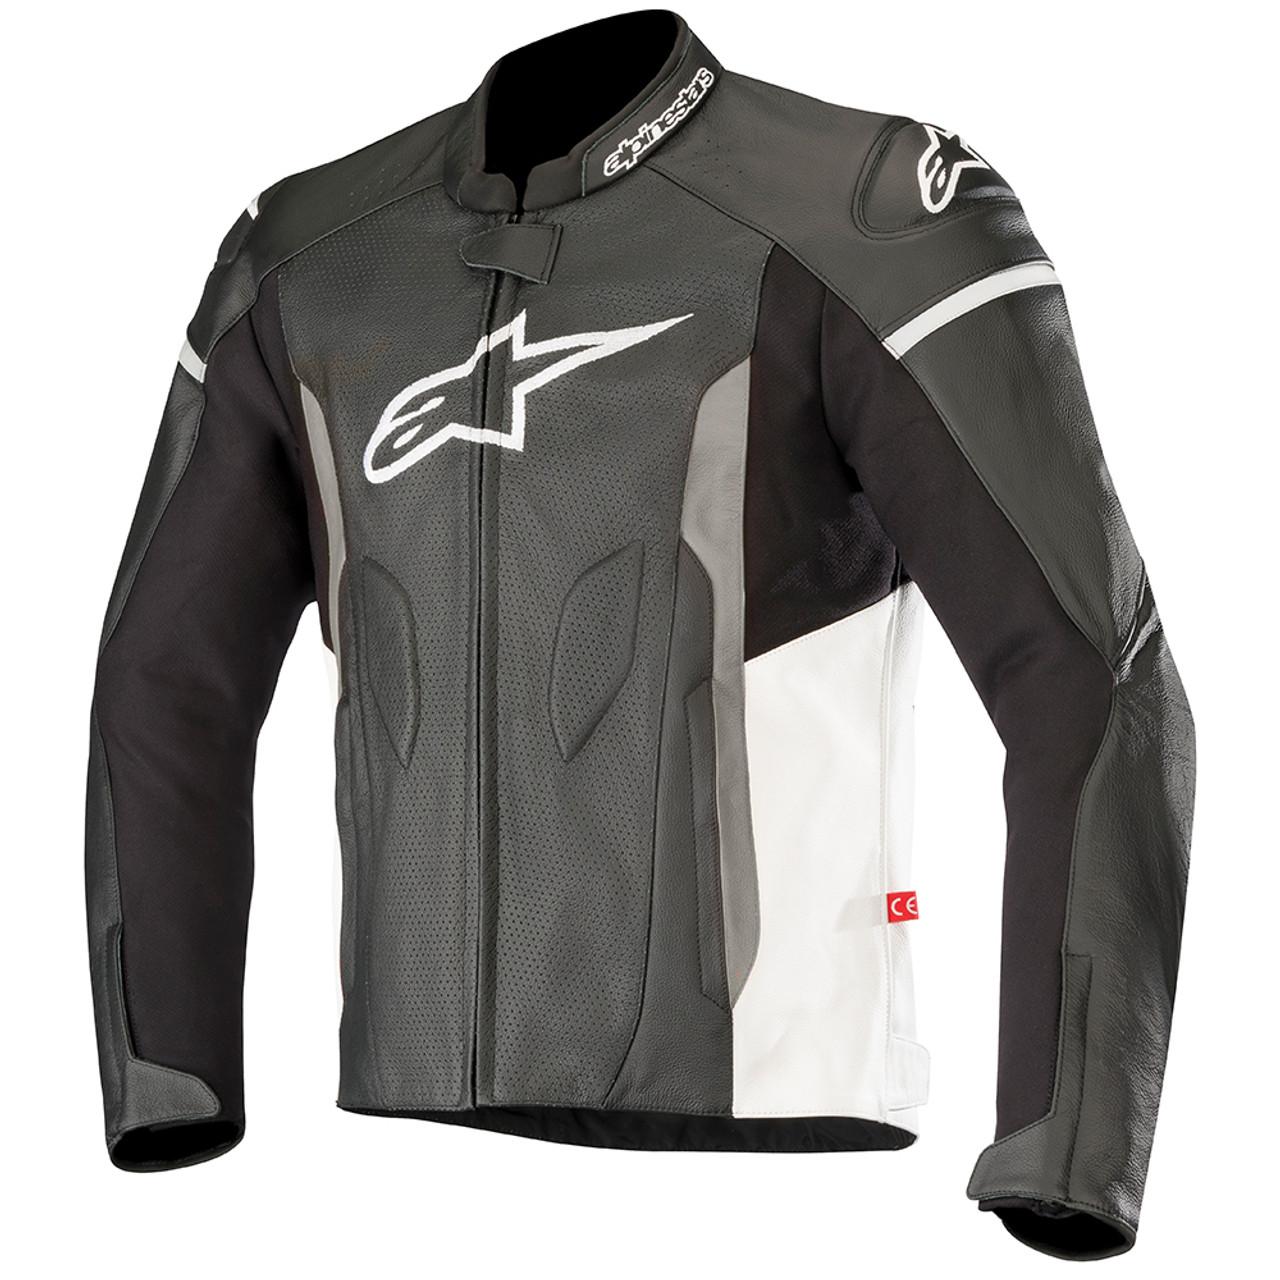 Alpinestars Leather Jacket >> Alpinestars Faster Airflow Leather Jacket Sportbike Track Gear